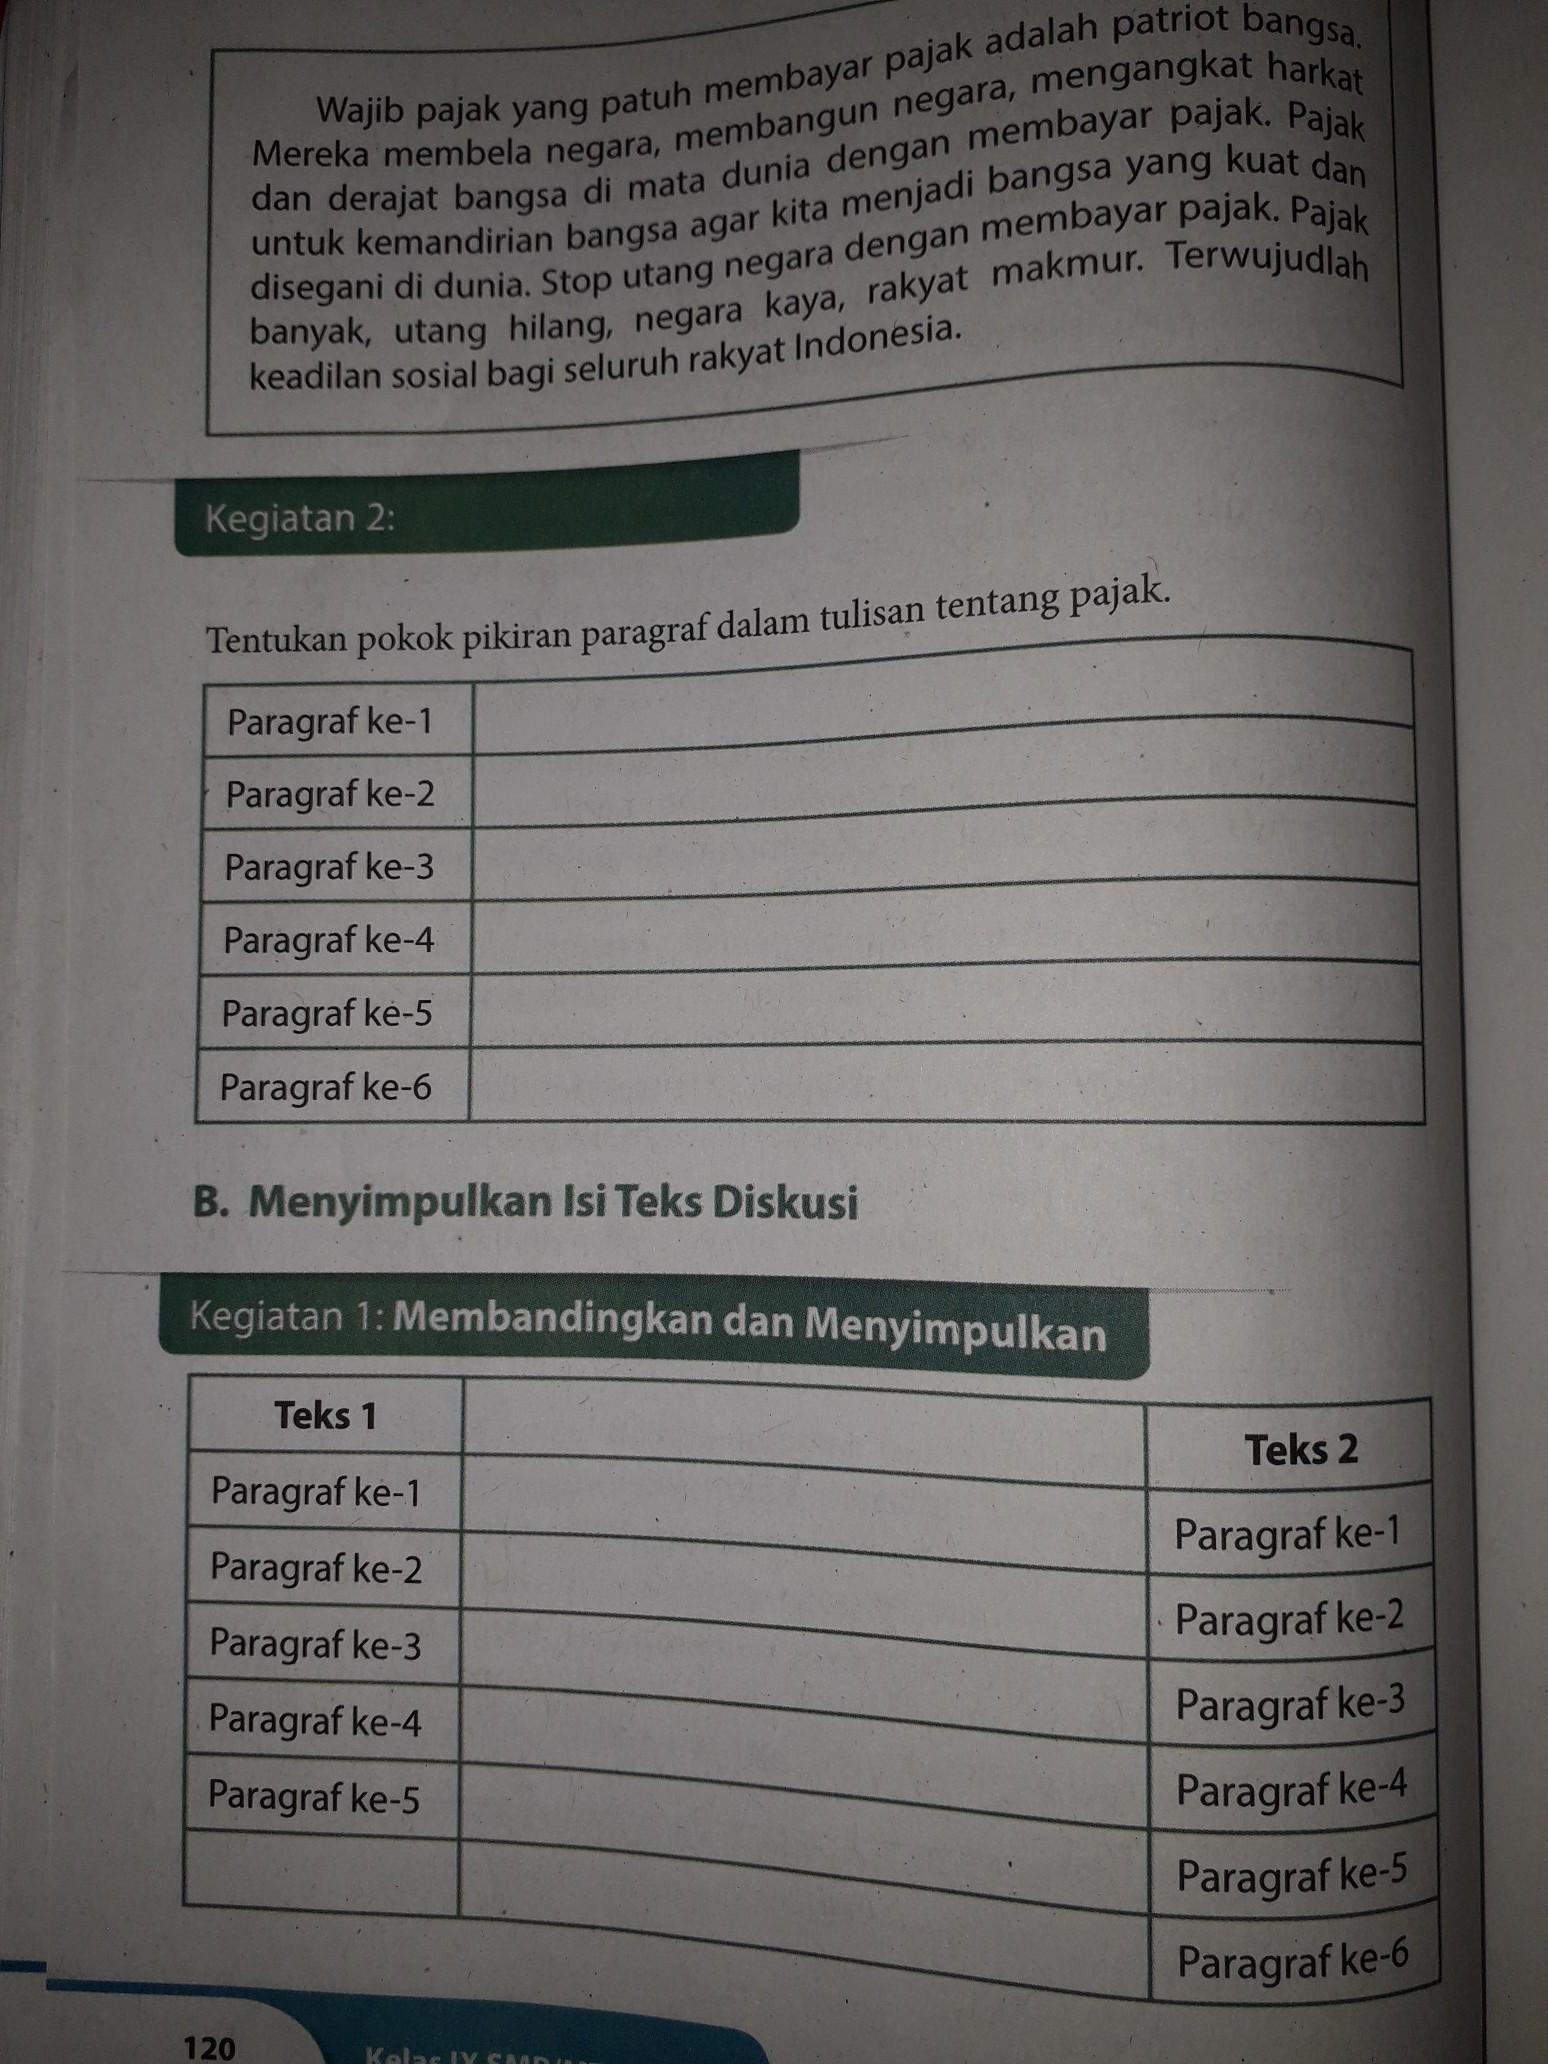 Jawaban Soal Bahasa Indonesia Kelas 9 Halaman 120 Brainly Co Id